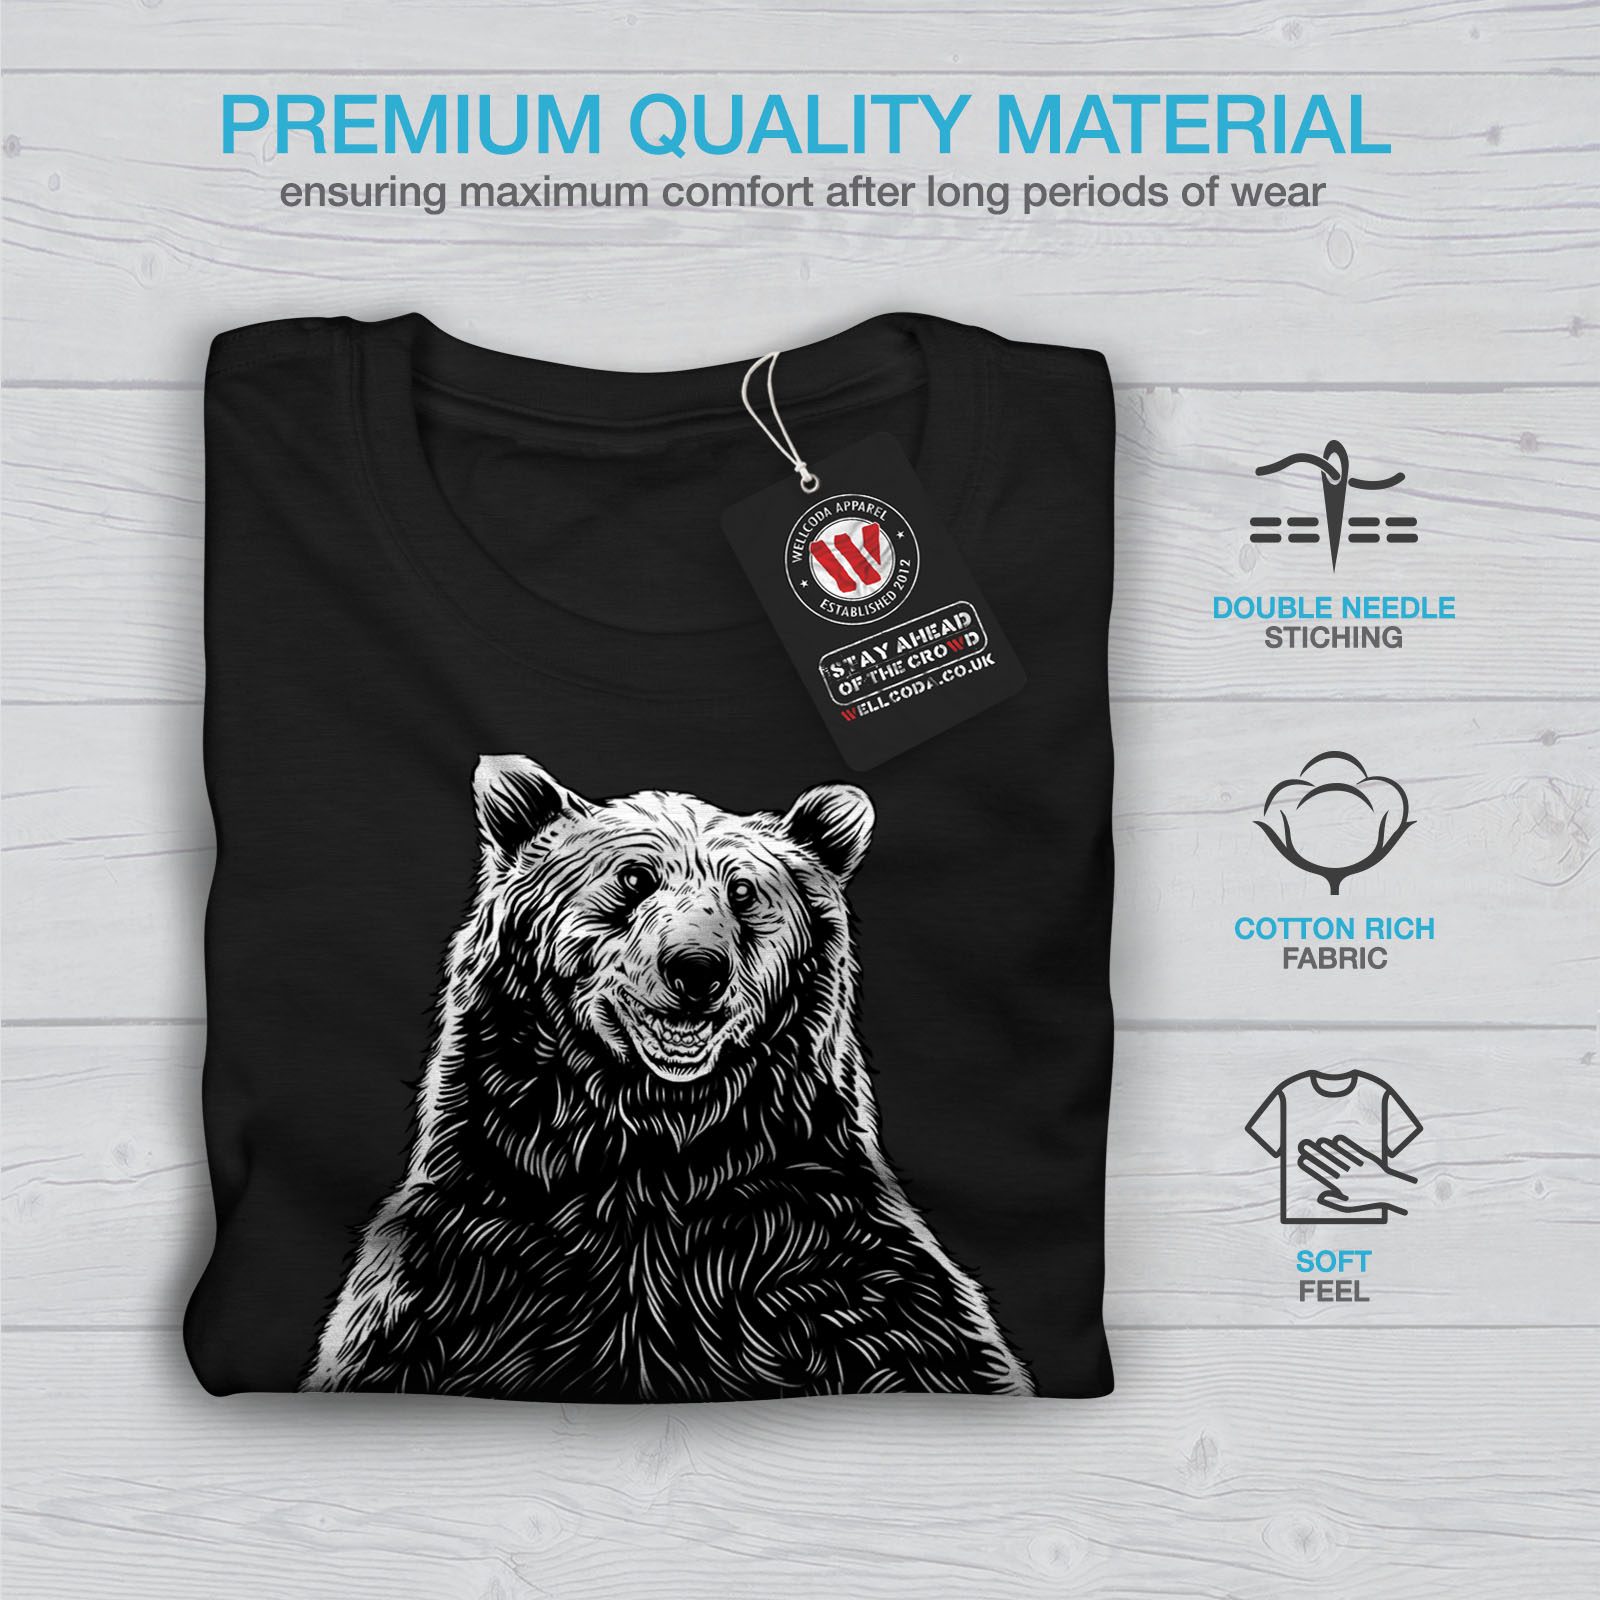 miniature 7 - Wellcoda Fishing Bear Angler Mens T-shirt, Grizzly Graphic Design Printed Tee